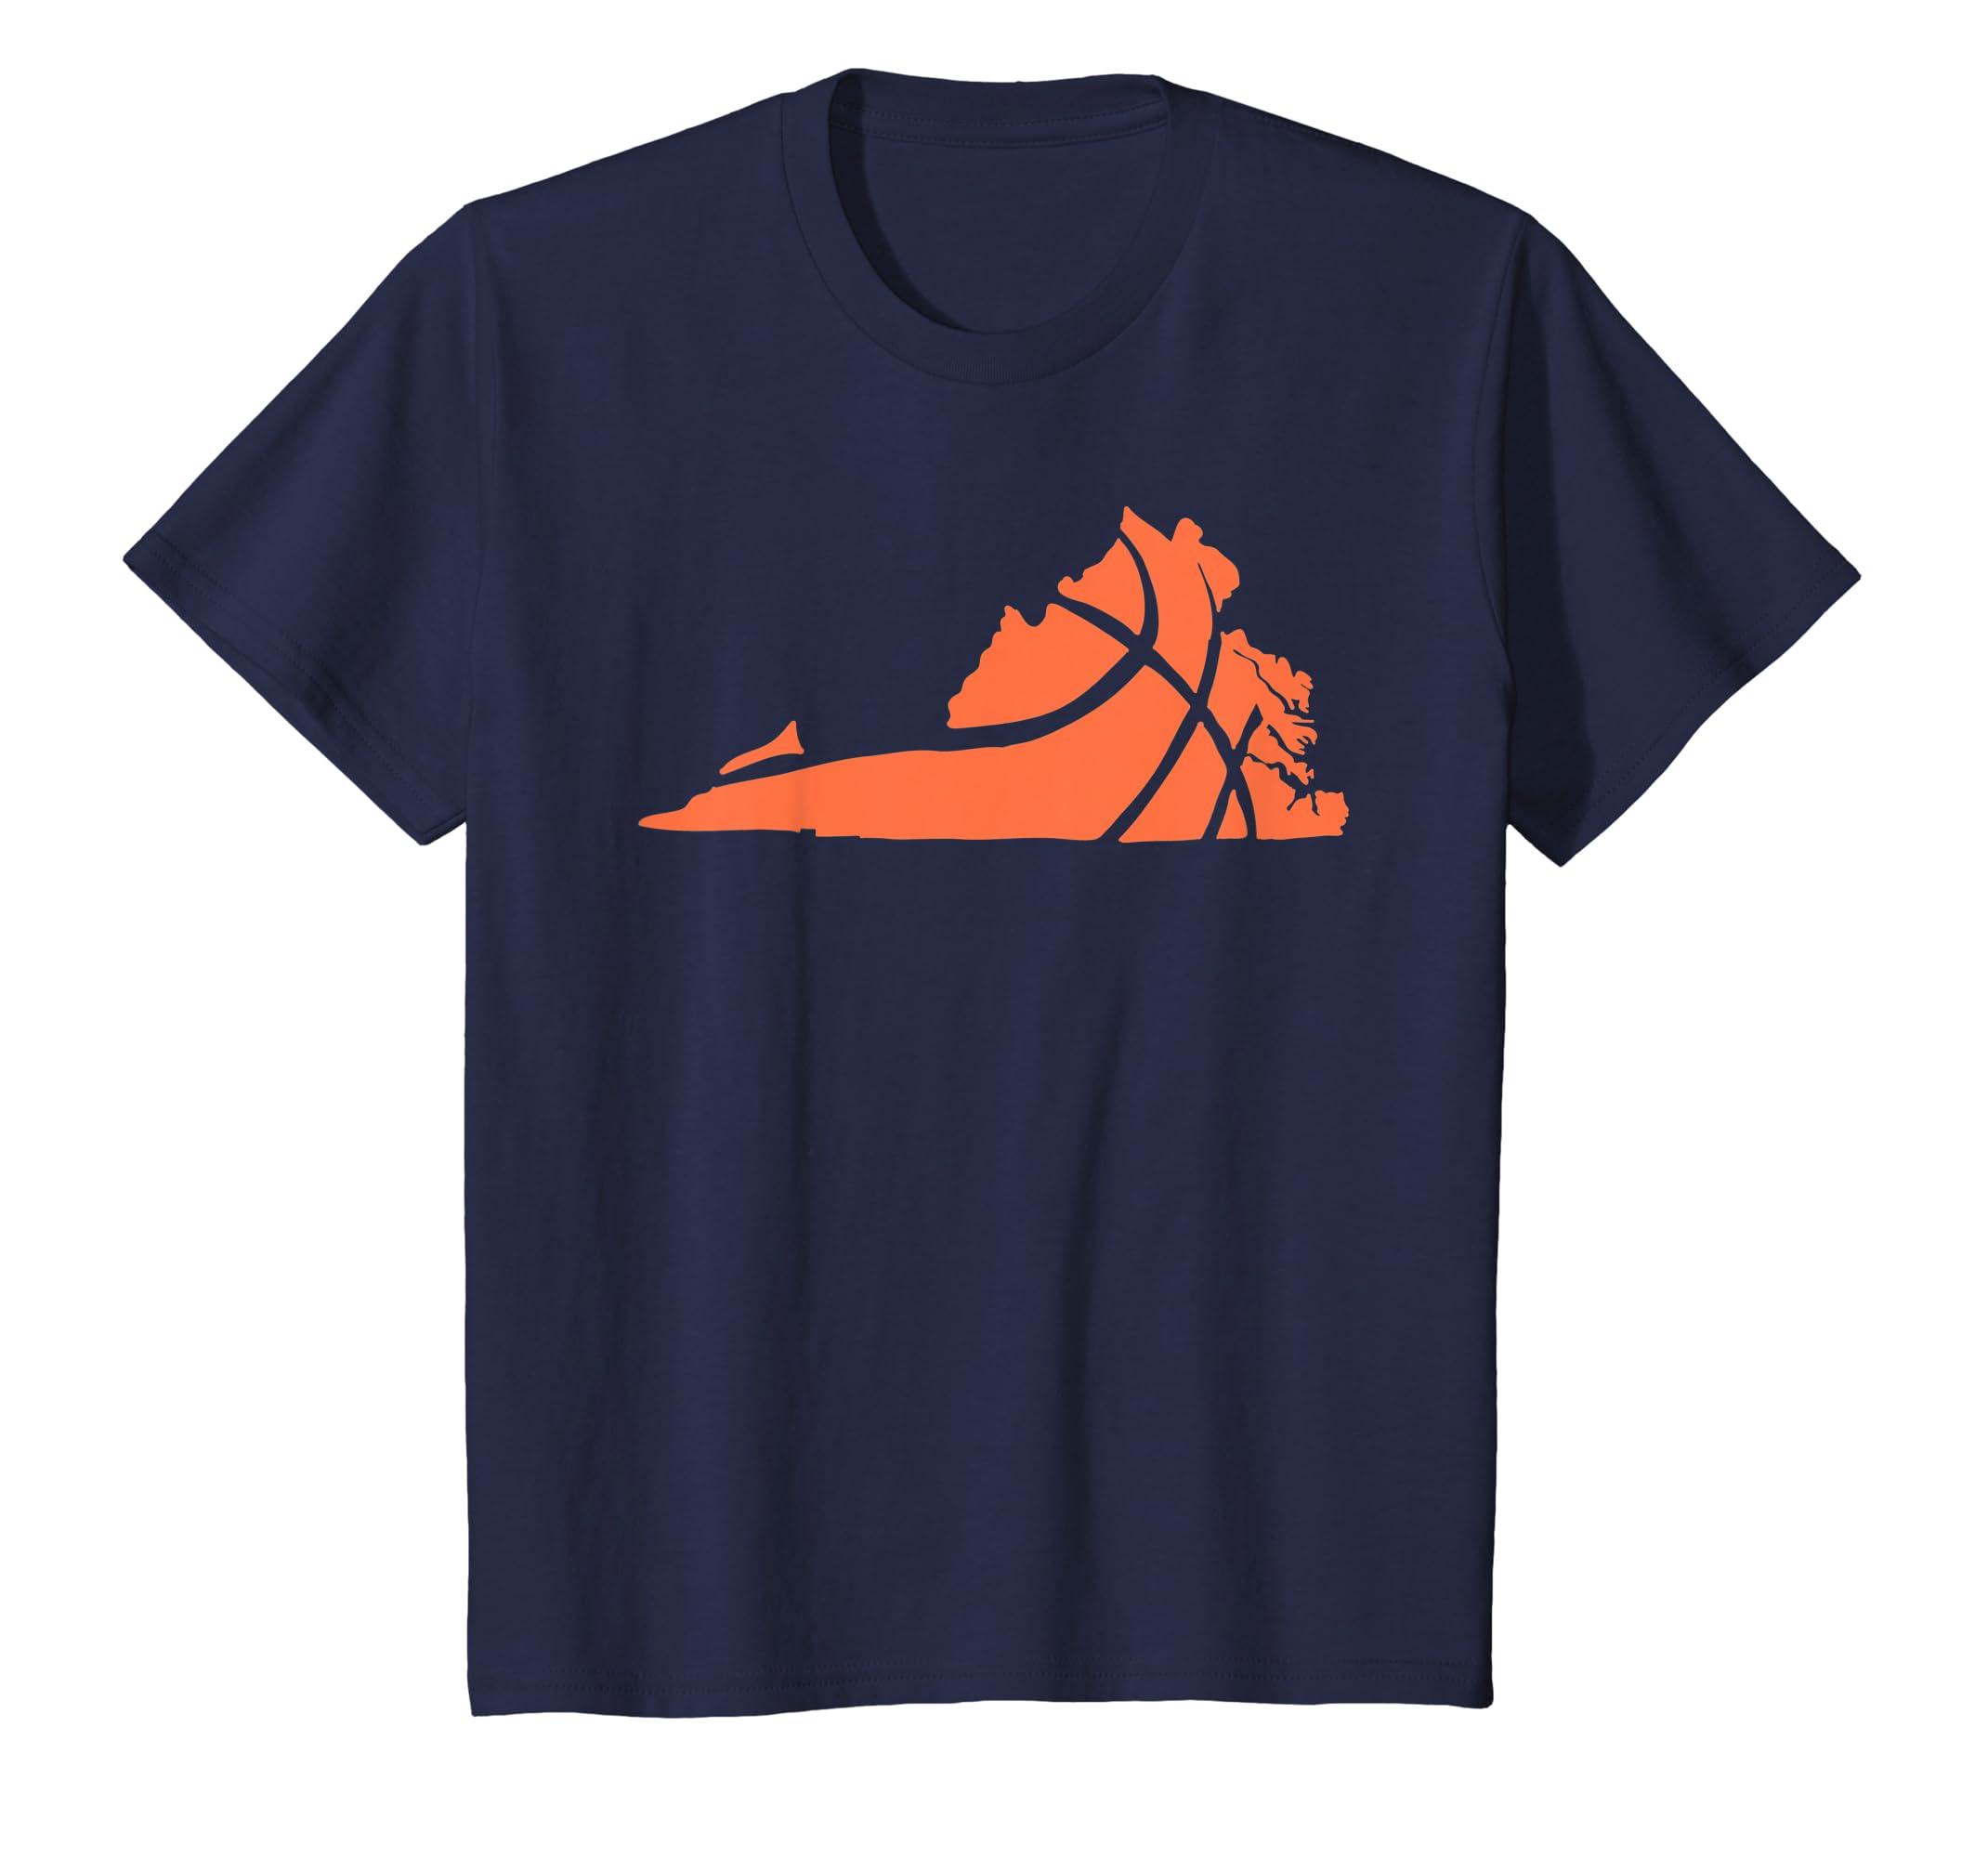 3e4dae272 Basketball T Shirts Designs - DREAMWORKS